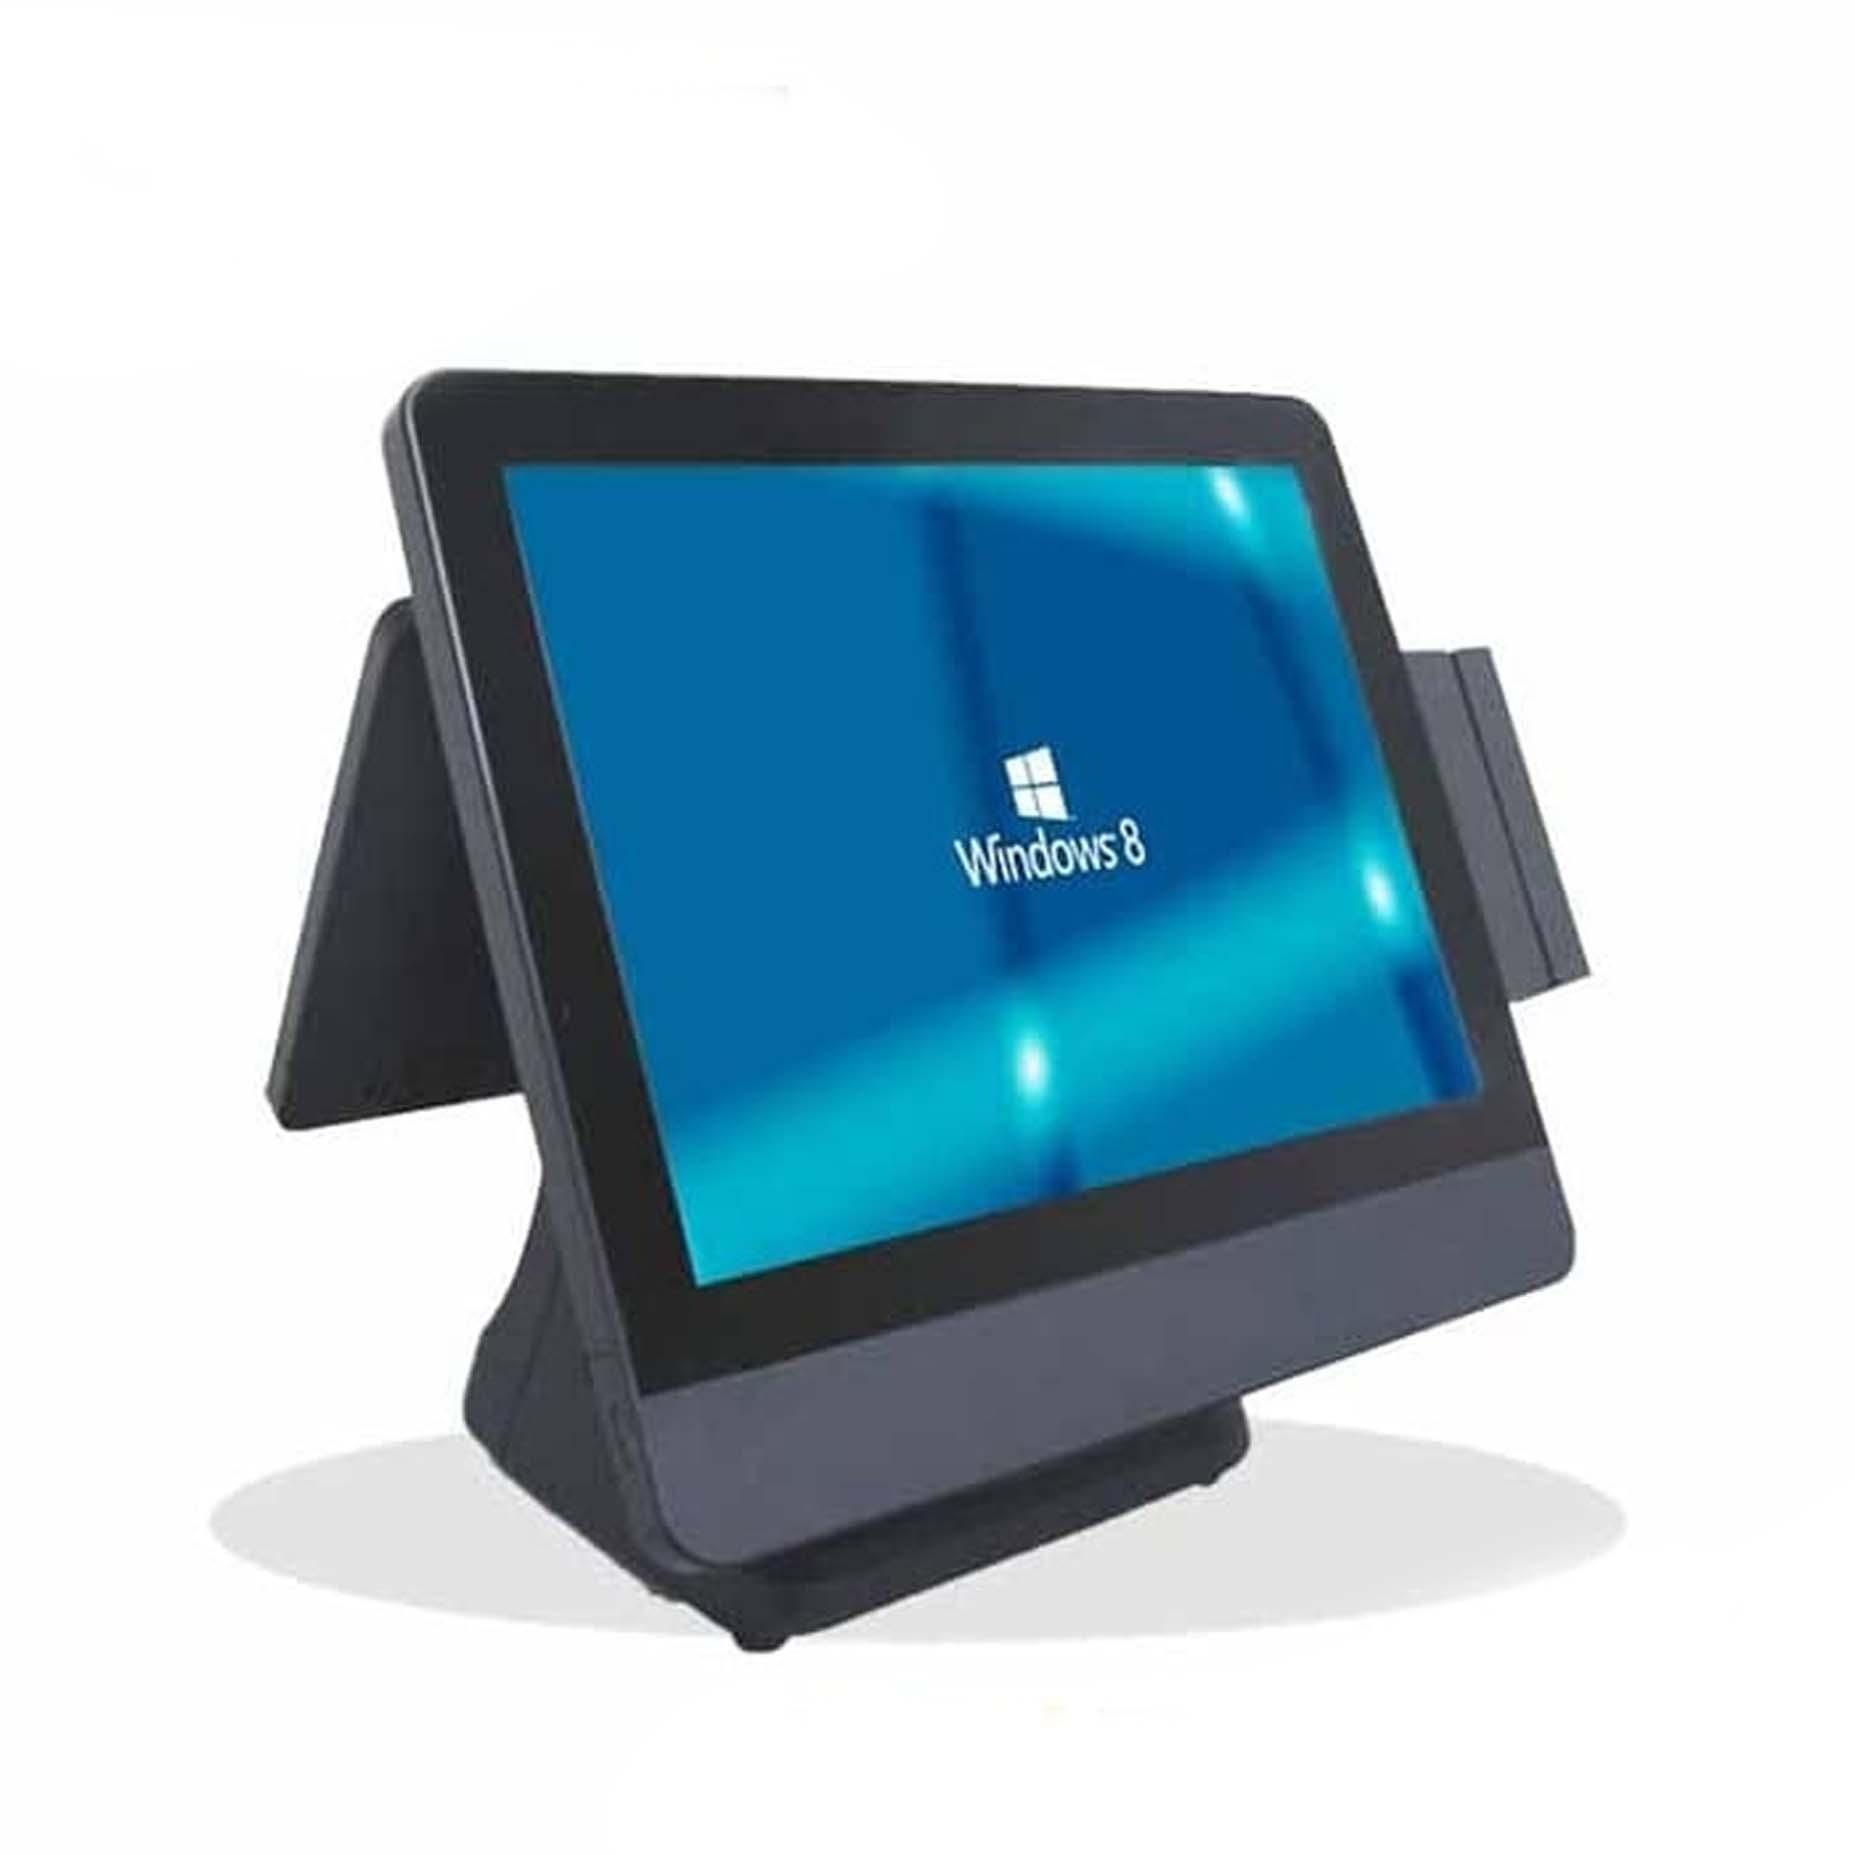 Harga Codesoft TCP-I500 Mesin Kasir Touchscreen